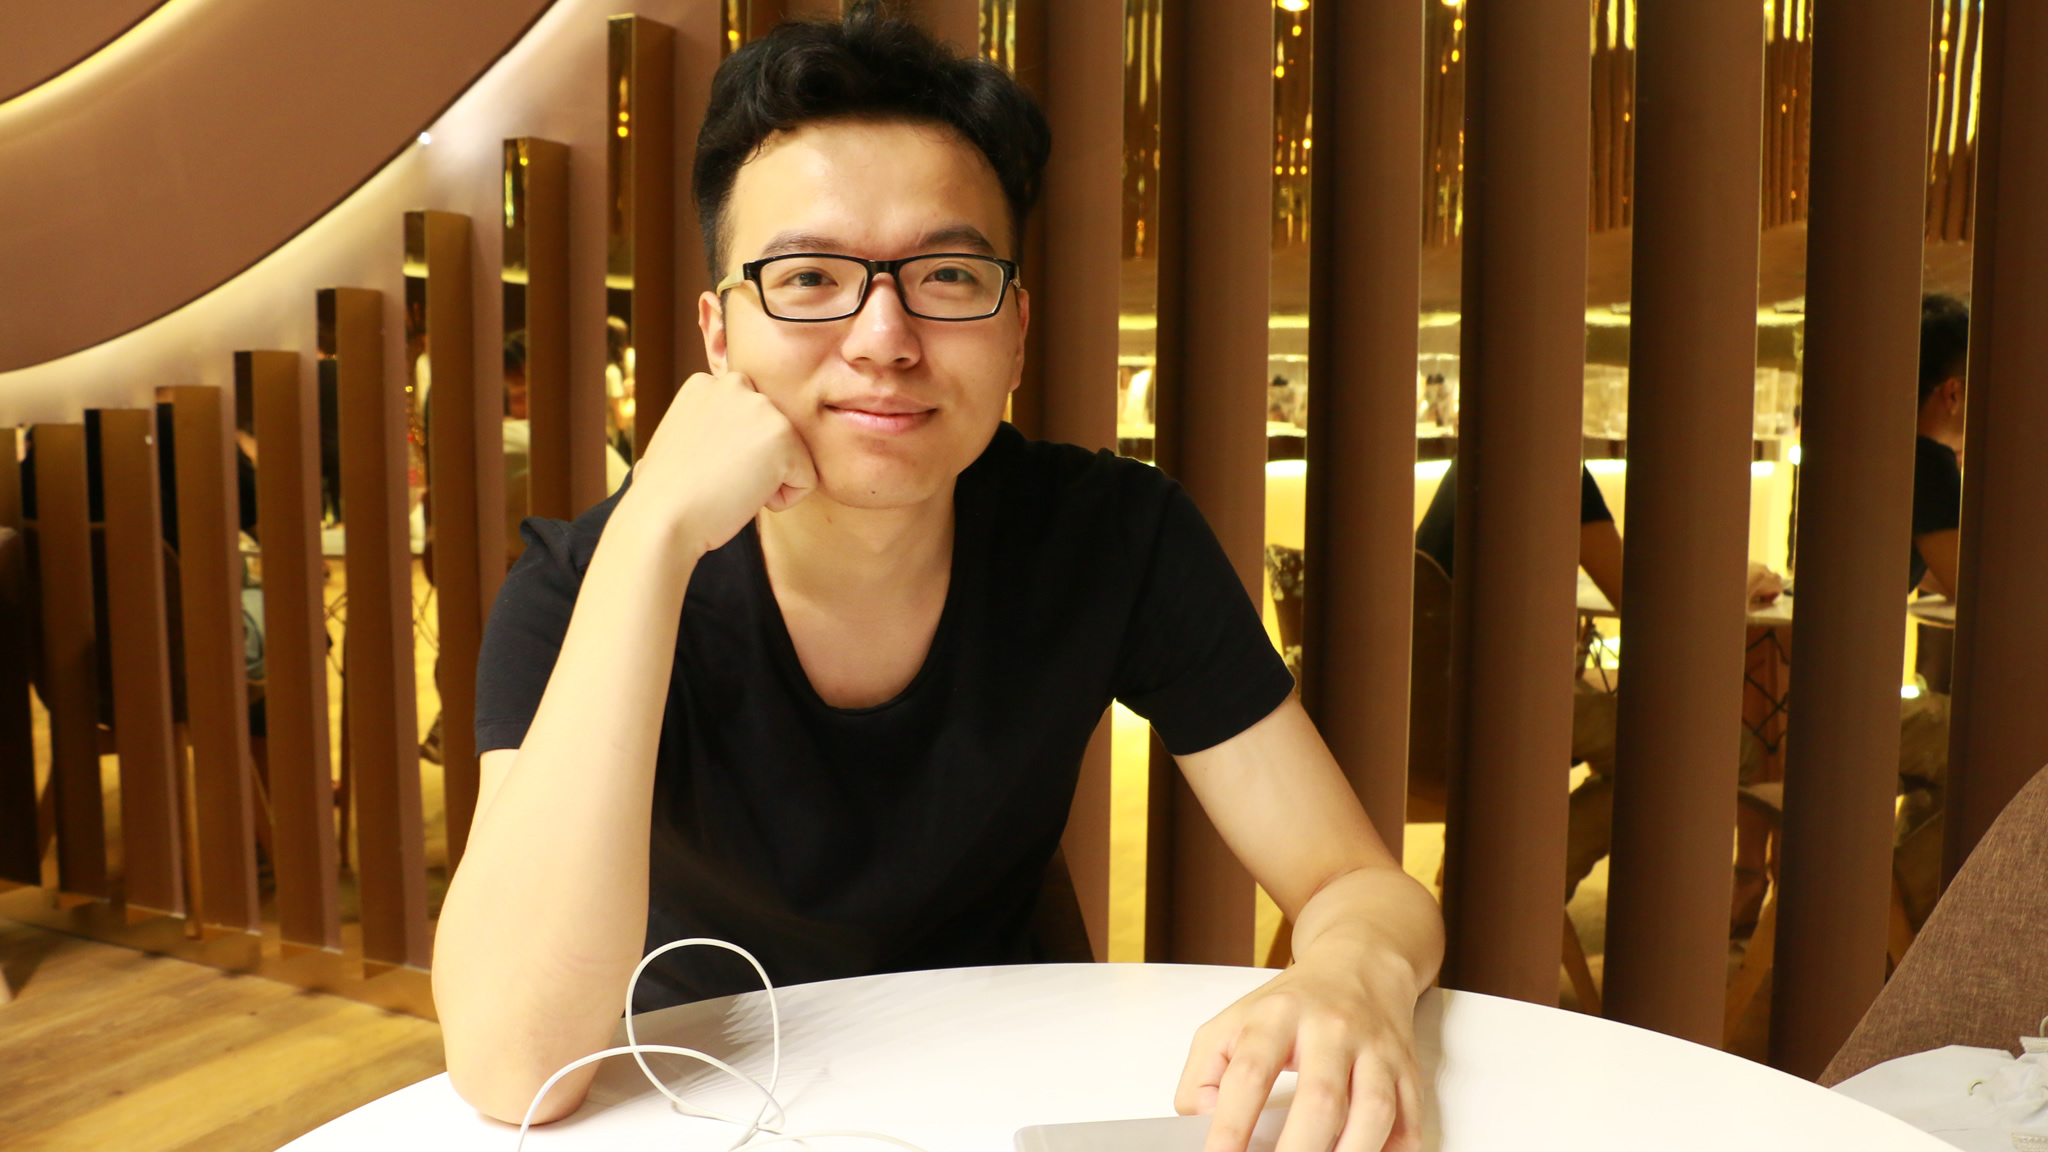 Zhangyang Hu